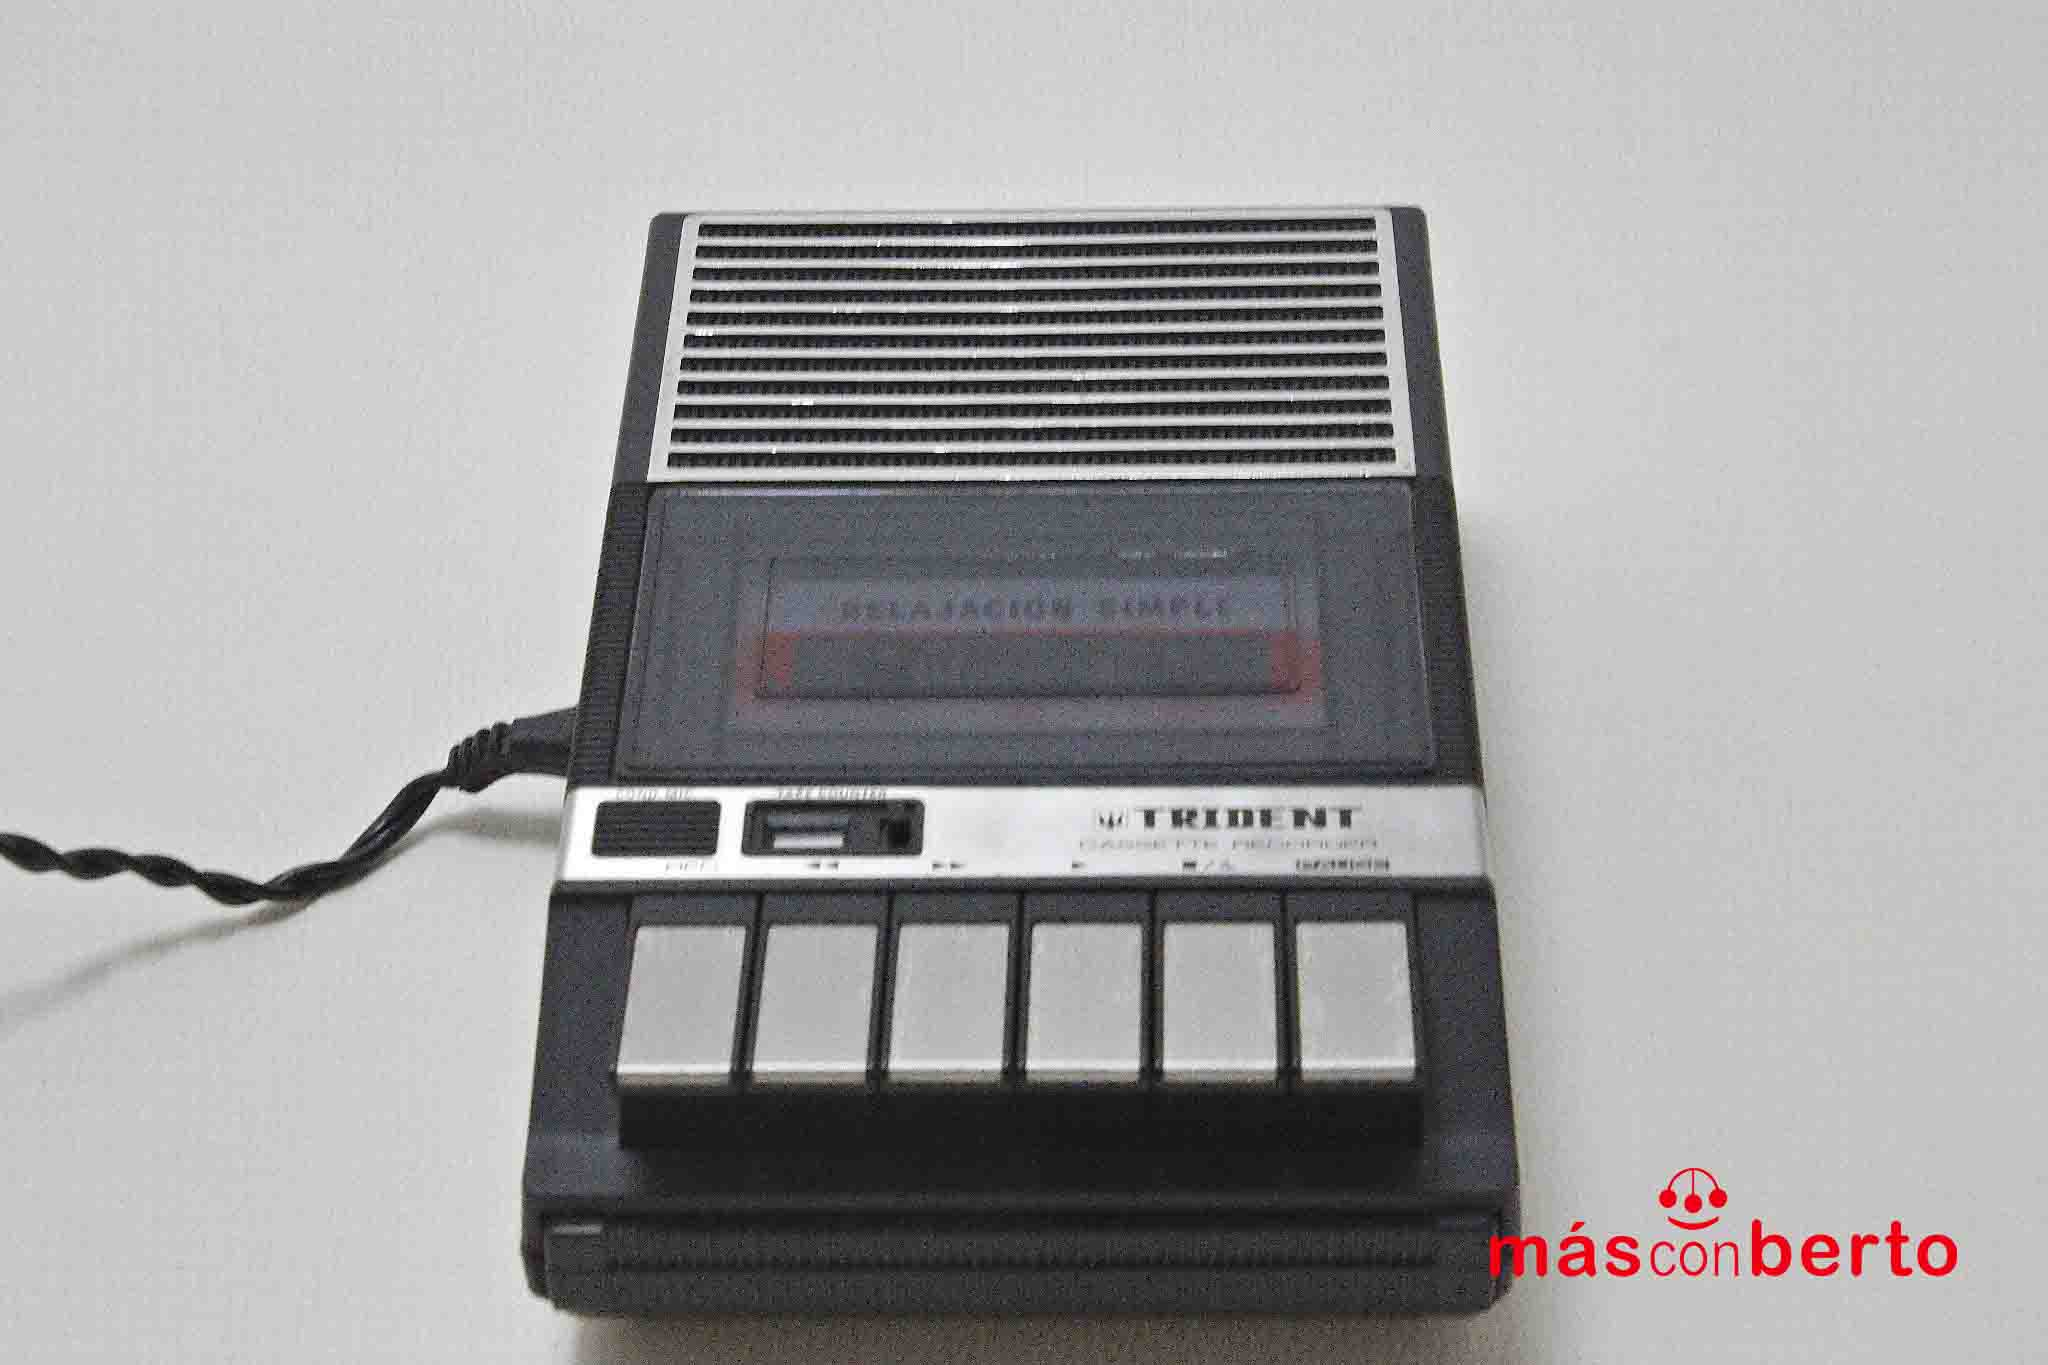 Cassette grabador Trident